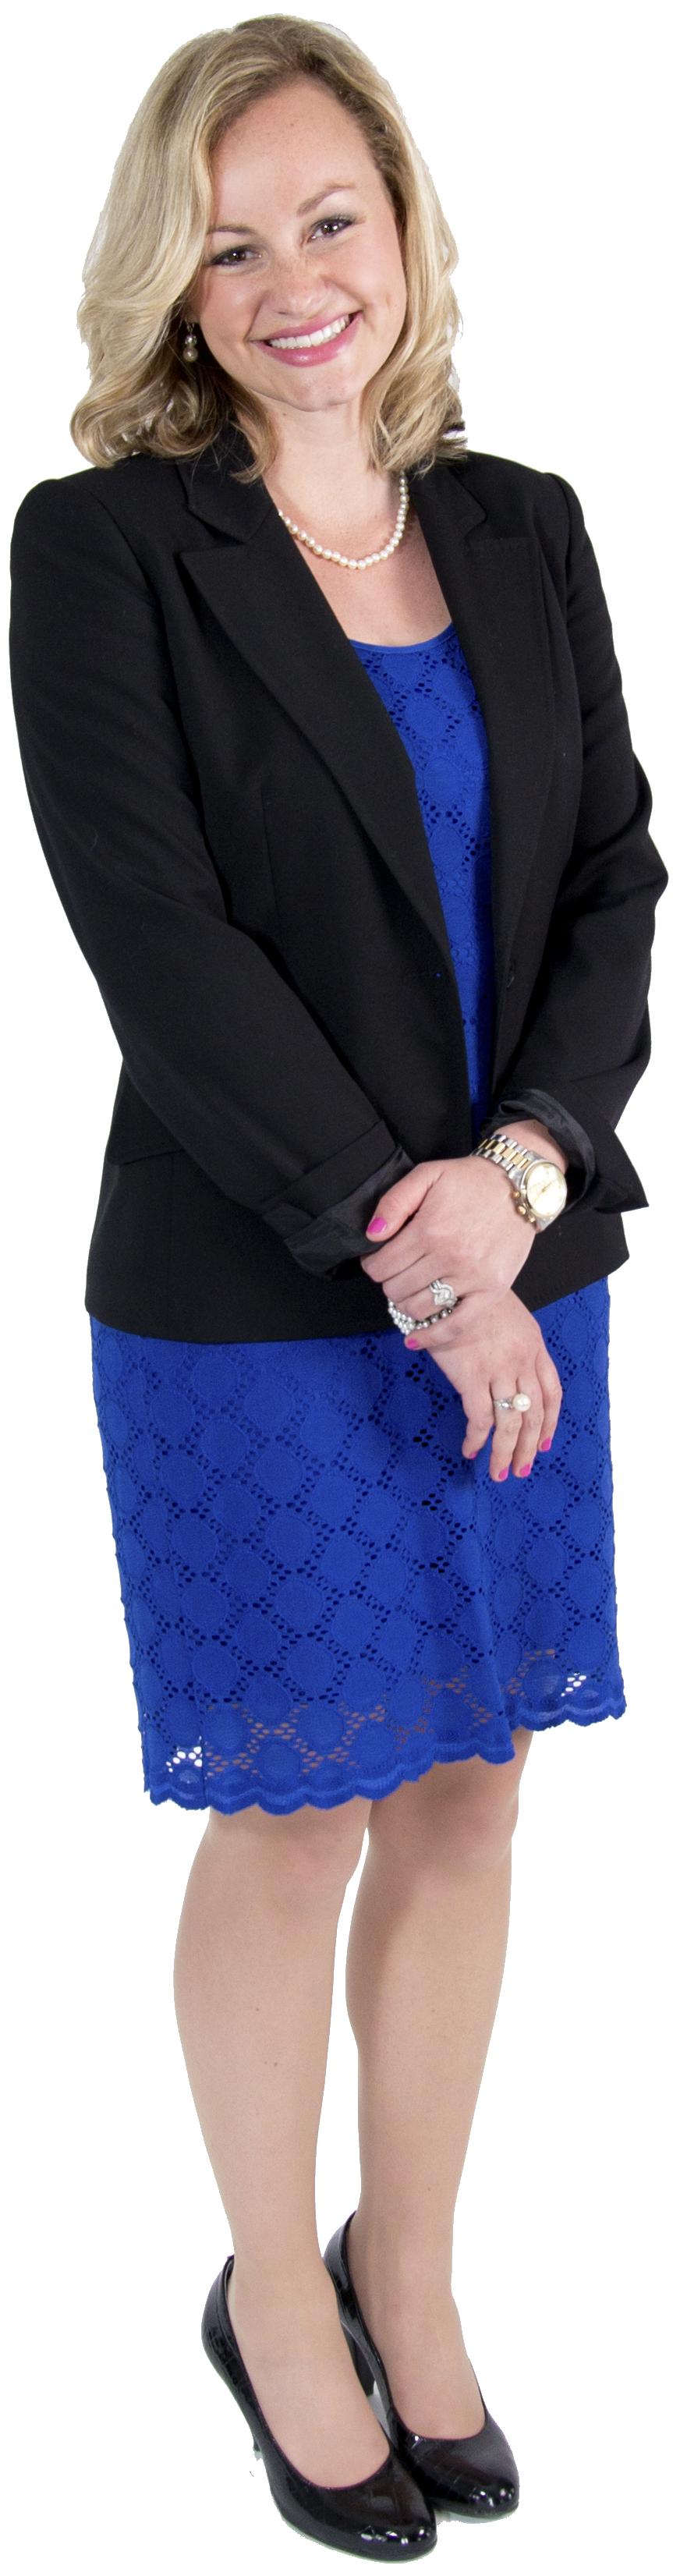 Lauren Cherry PHR Integrity HR Photo